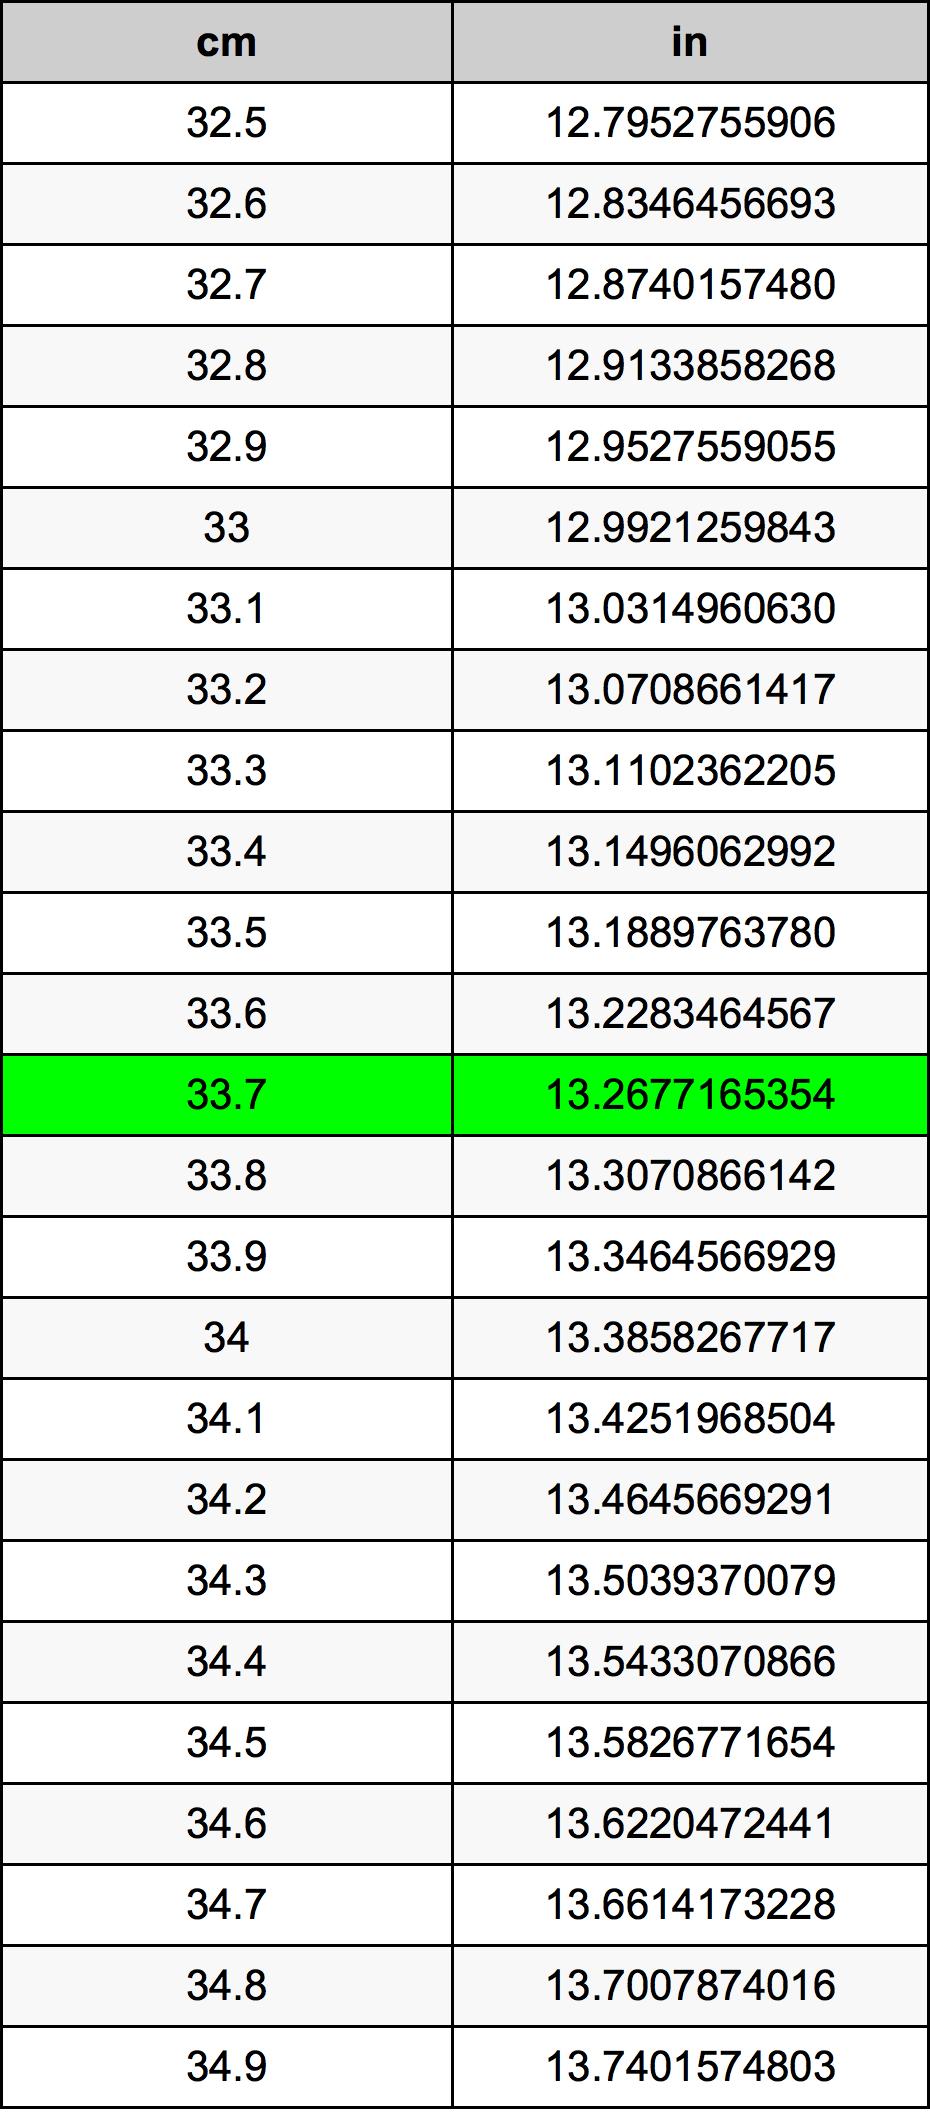 33.7 Centimeter pretvorbena tabela